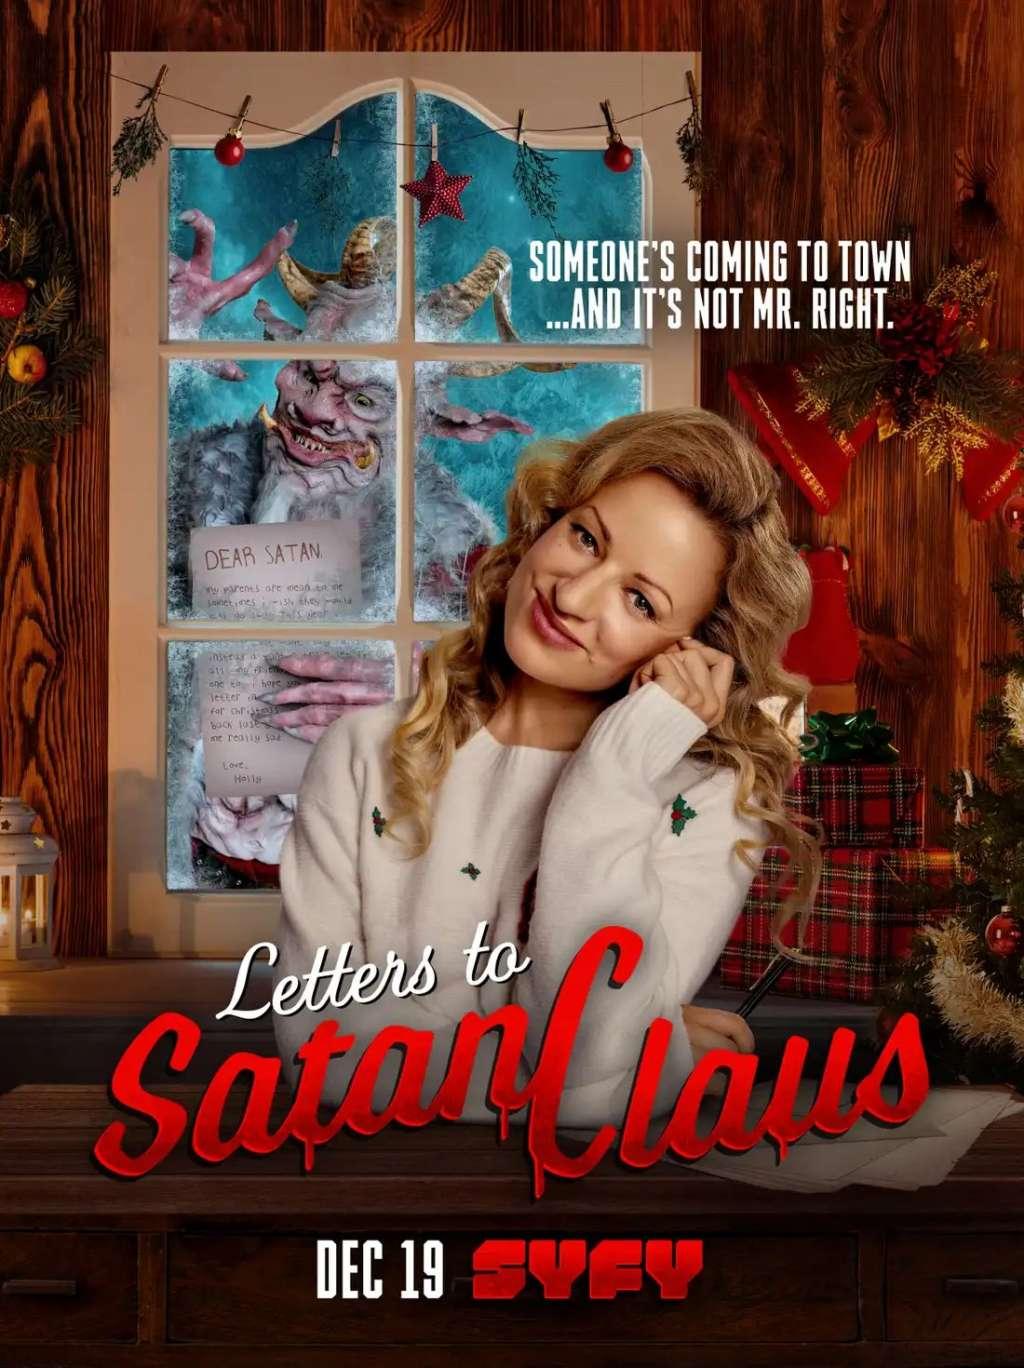 Letters to Satan Claus kapak